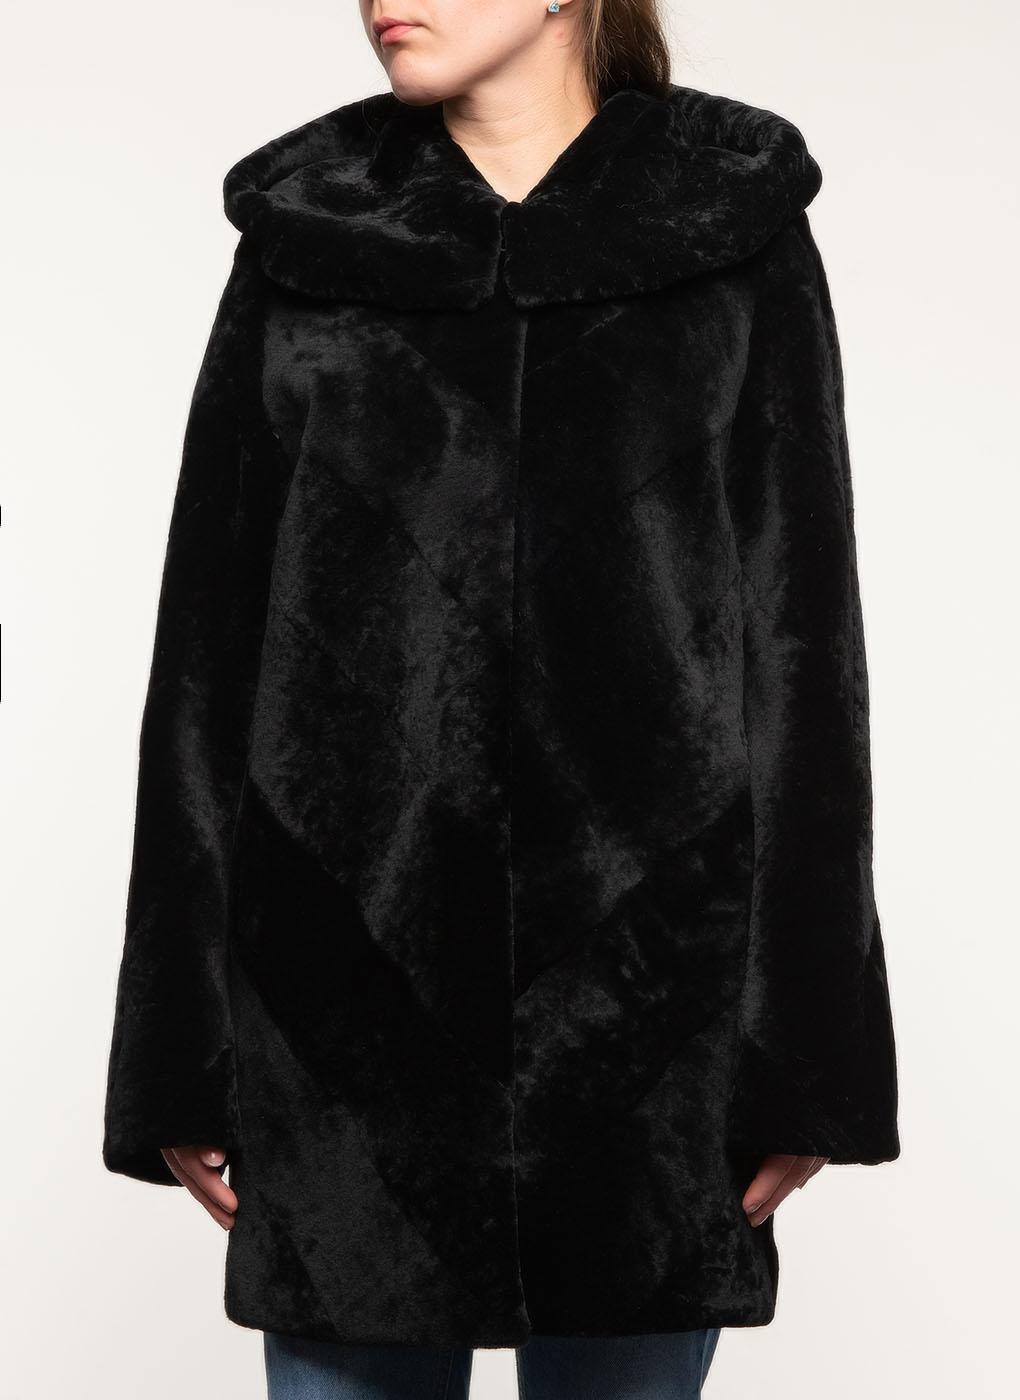 Куртка из овчины 04, Dzhanbekoff фото